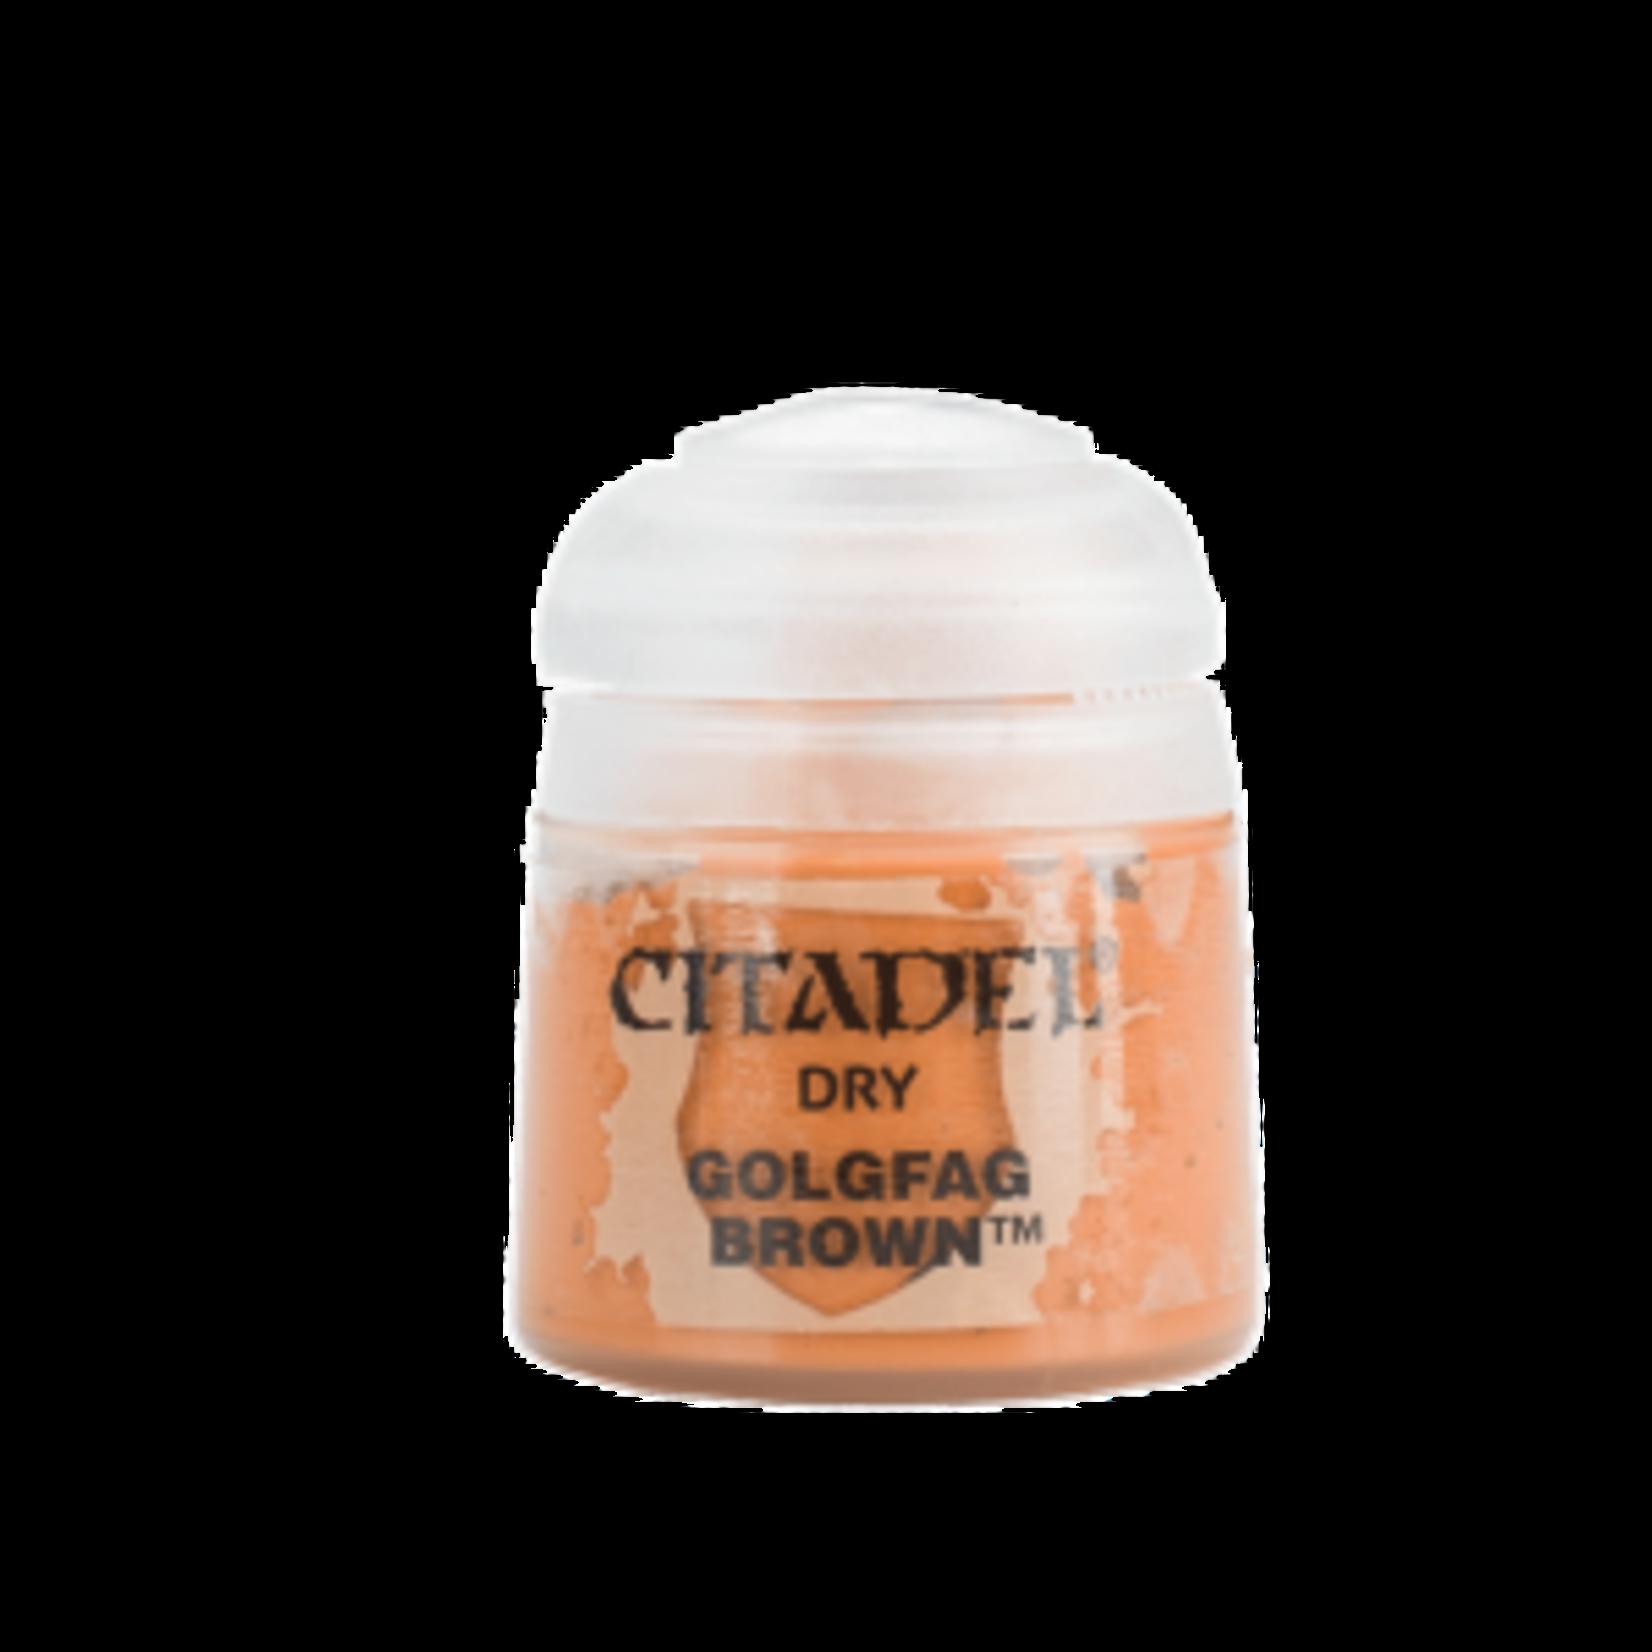 Citadel Dry Golgfag Brown